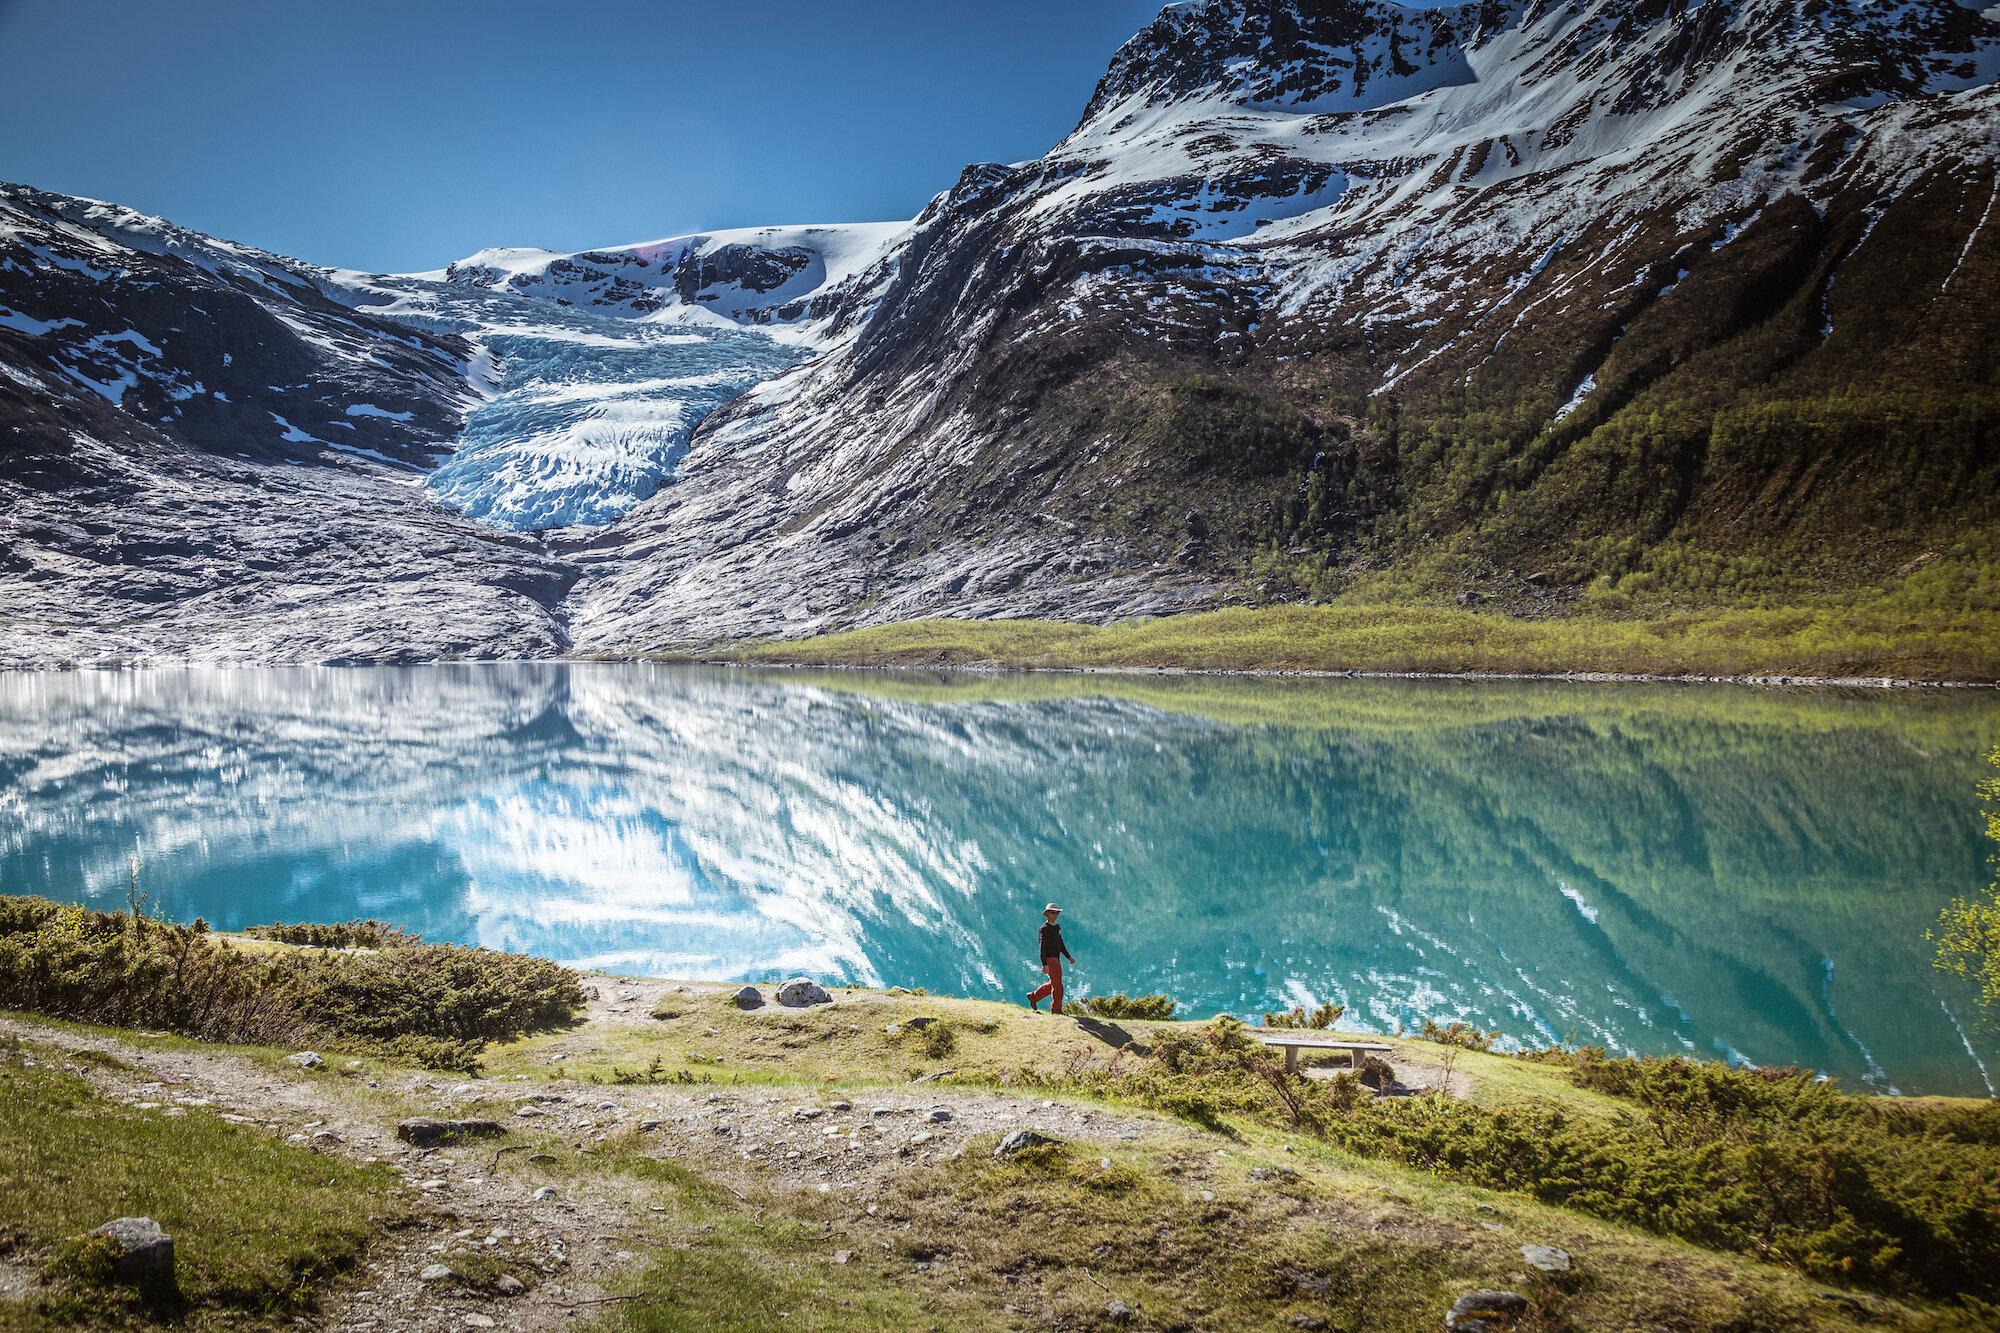 Exploring the stunning Norwegian fjords